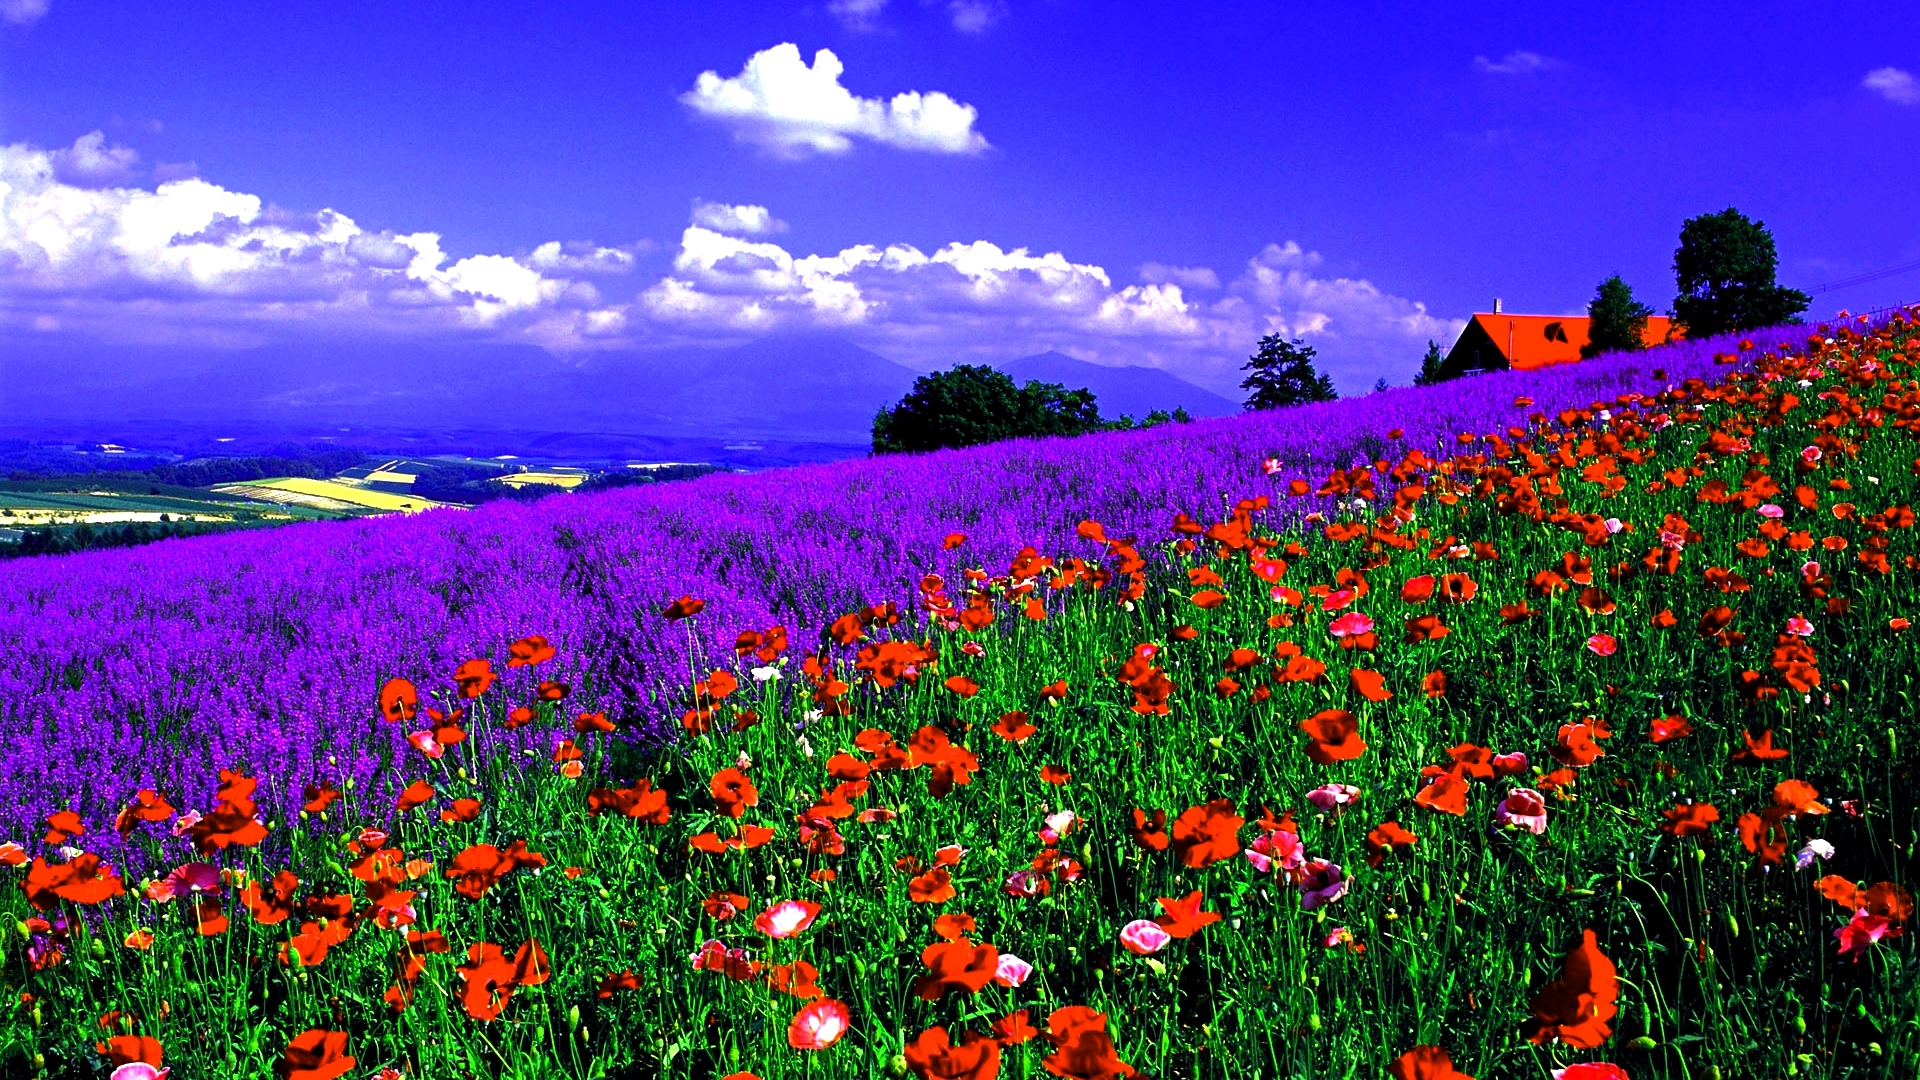 Terra natura paesaggi natura fiori spring sfondo for Sfondi desktop hd paesaggi